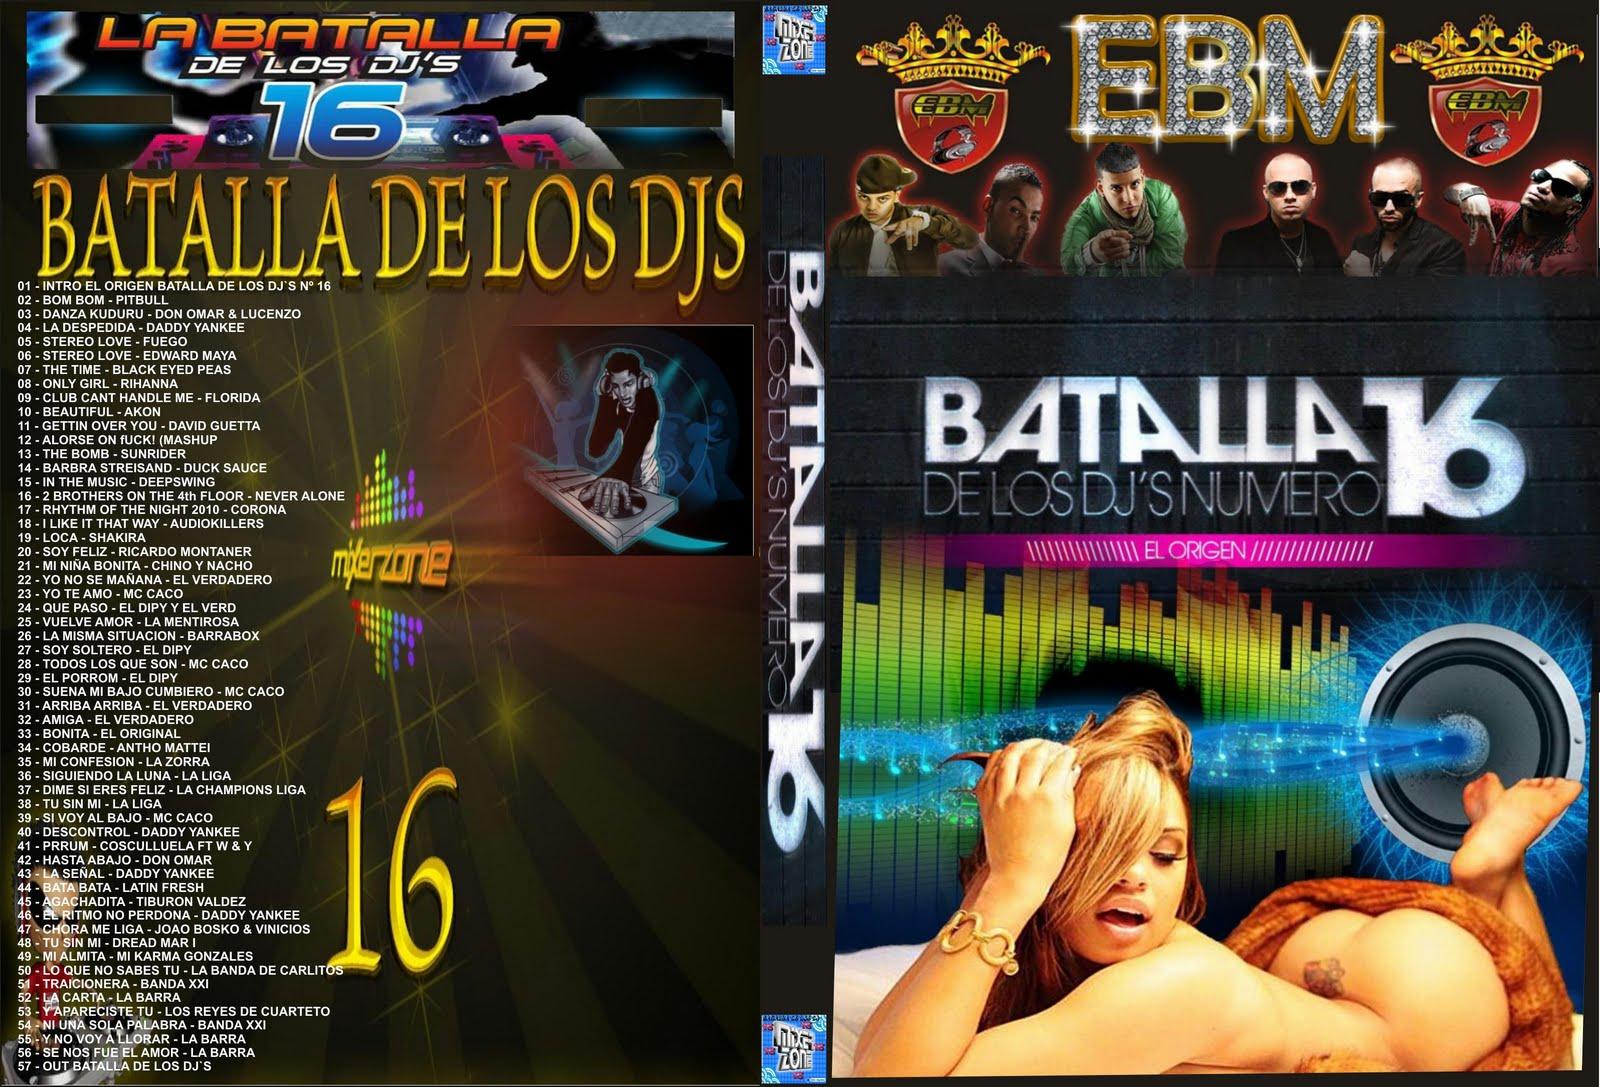 http://1.bp.blogspot.com/-rMGyNq6HyOI/TdxQ4ge92dI/AAAAAAAAATk/U5CZd8eKNSs/s1600/batalla+delos+dj+16.JPG